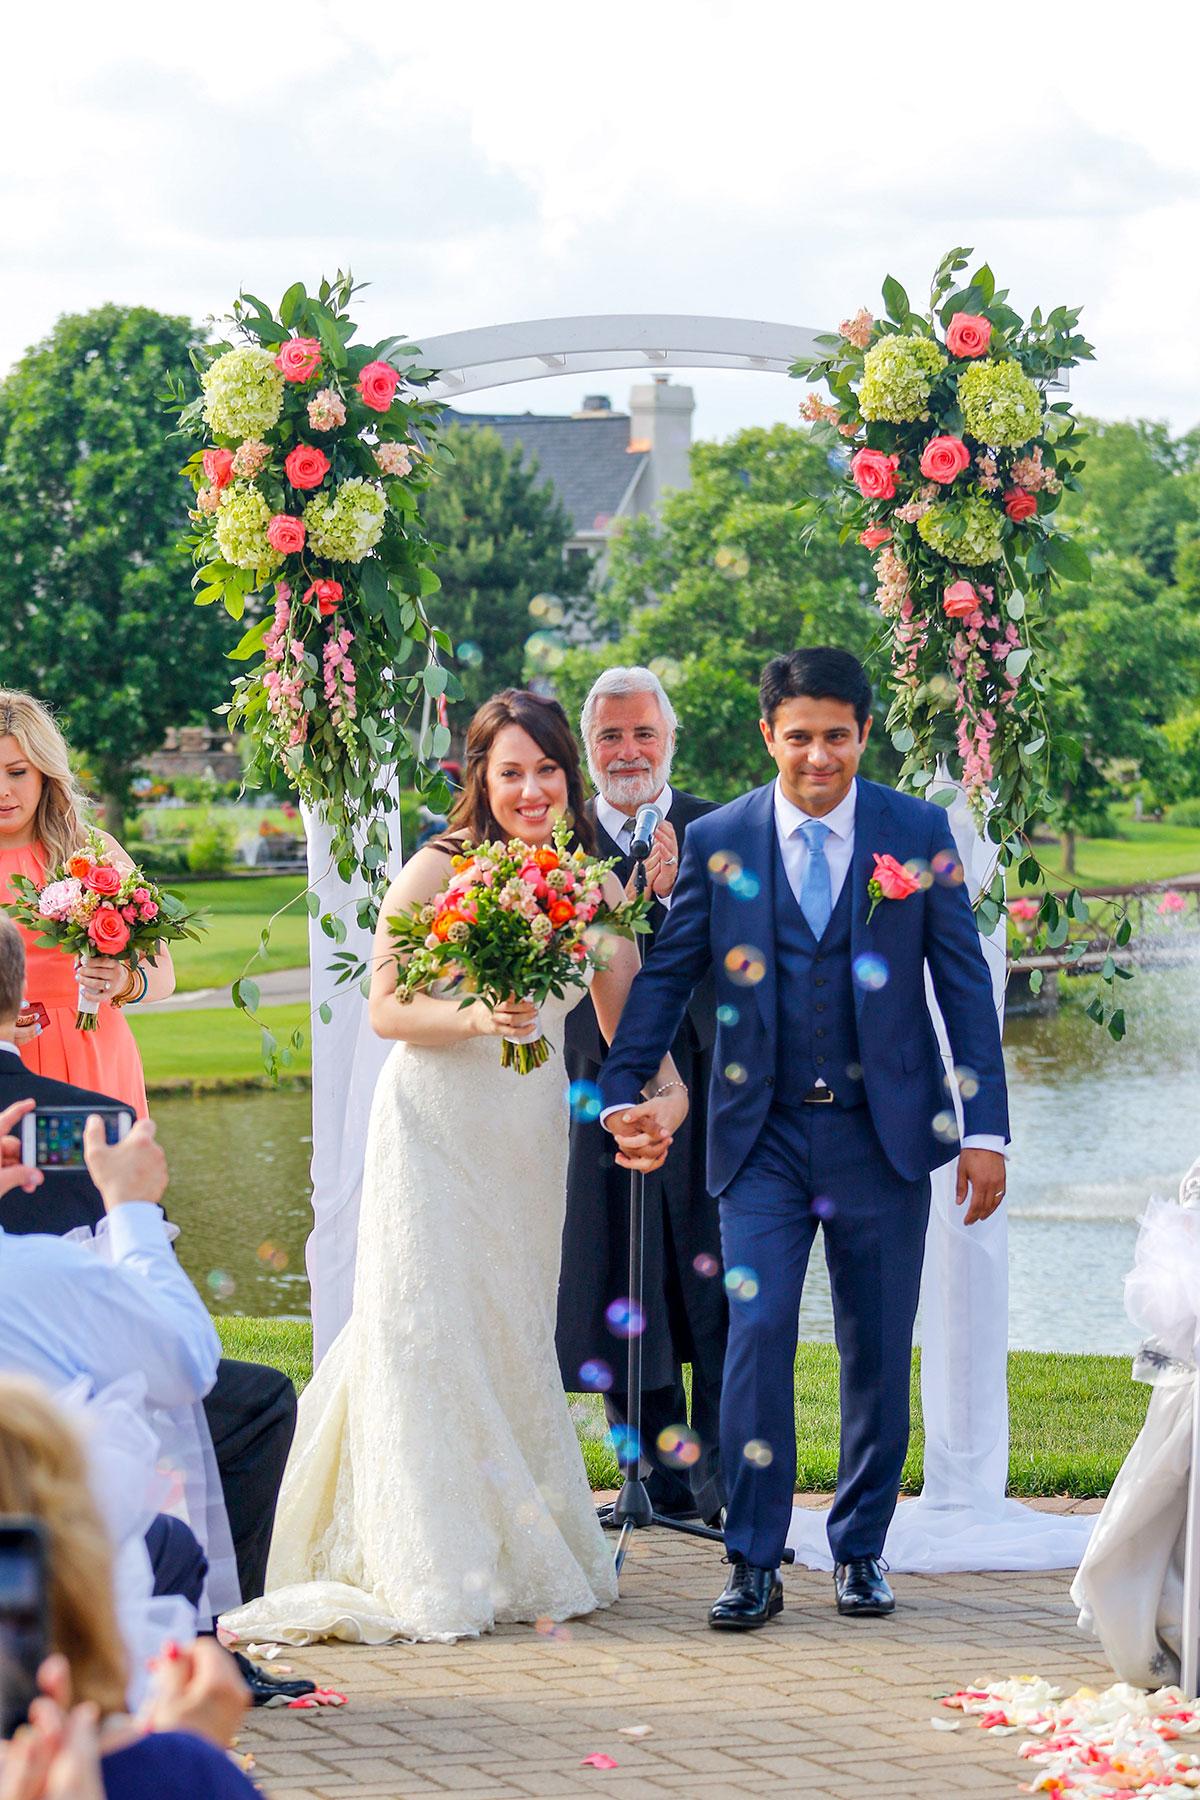 Wedding_Chicago_Anurag_Christine_08.JPG